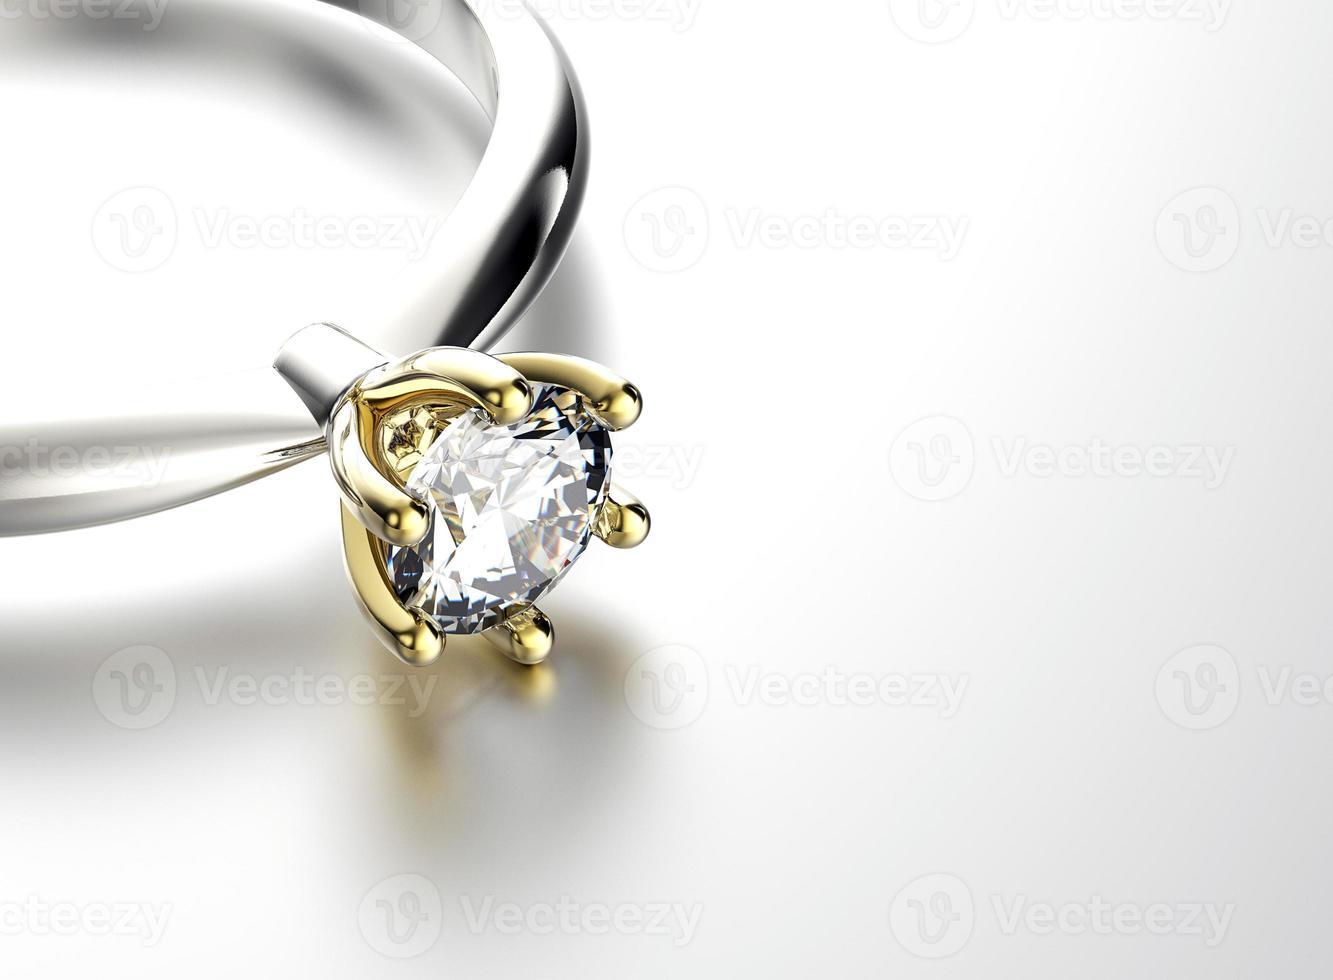 anel de noivado com diamante ou moissanite. fundo de joias foto